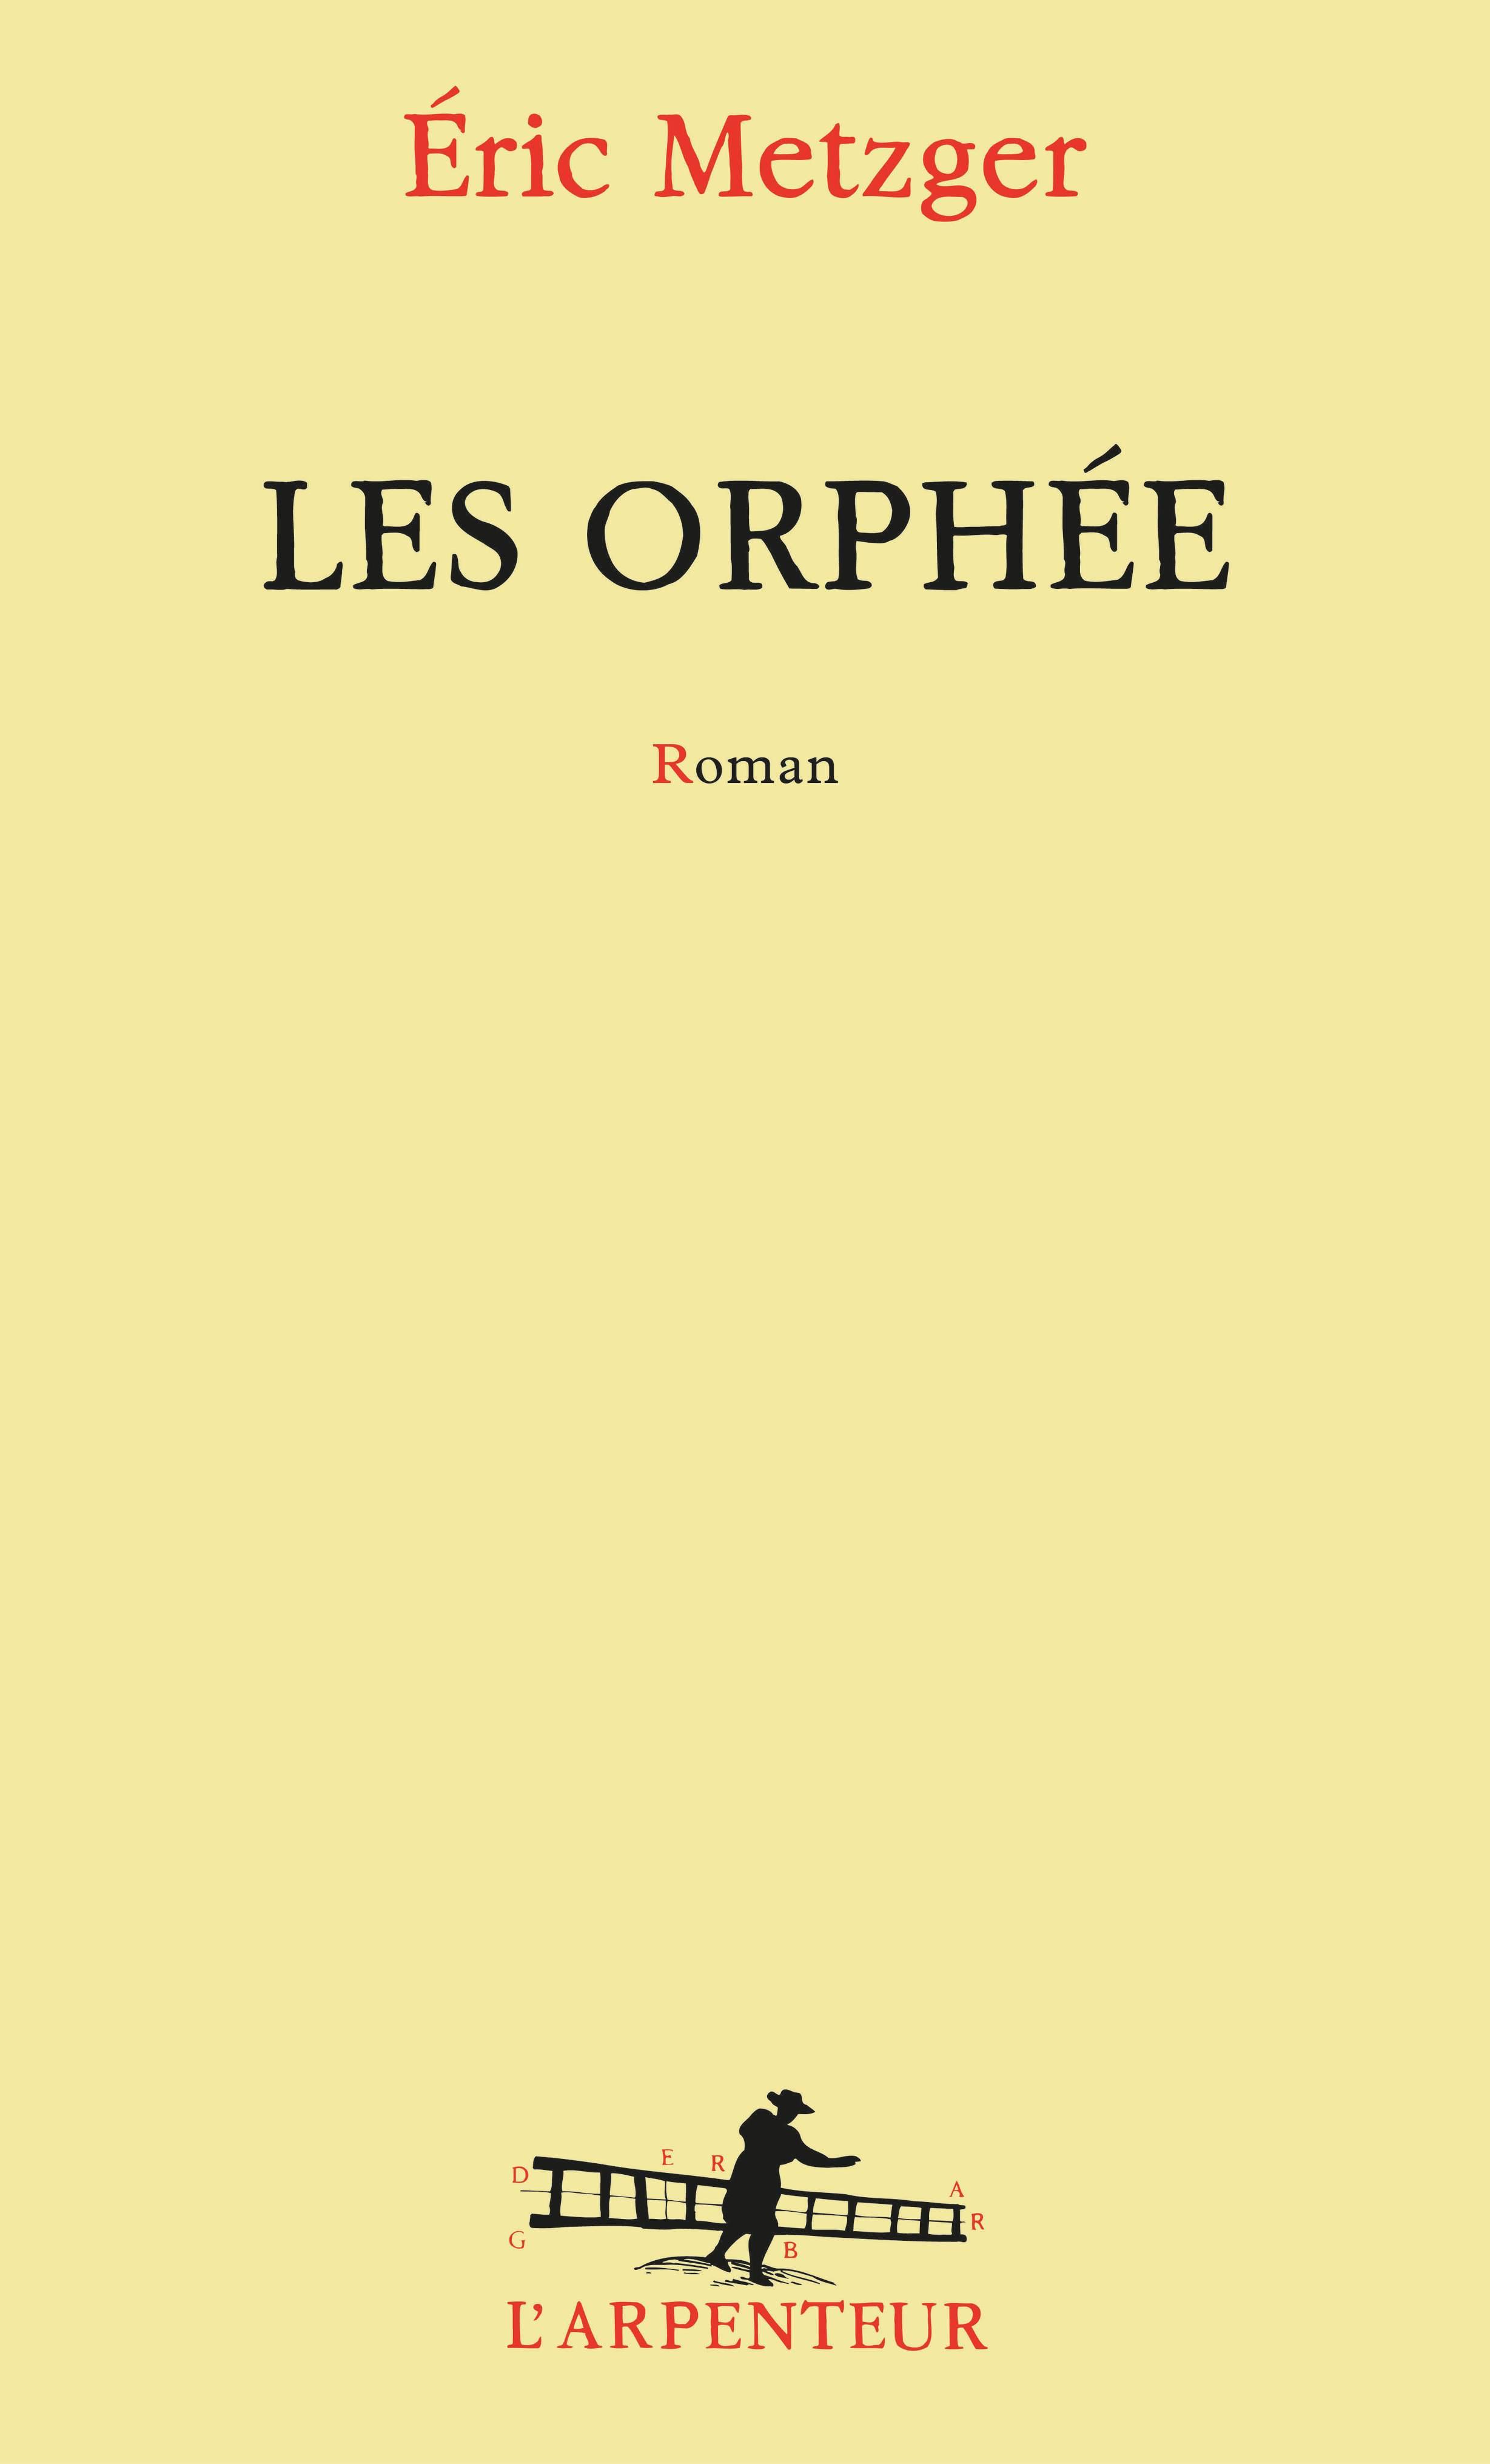 LES ORPHEE